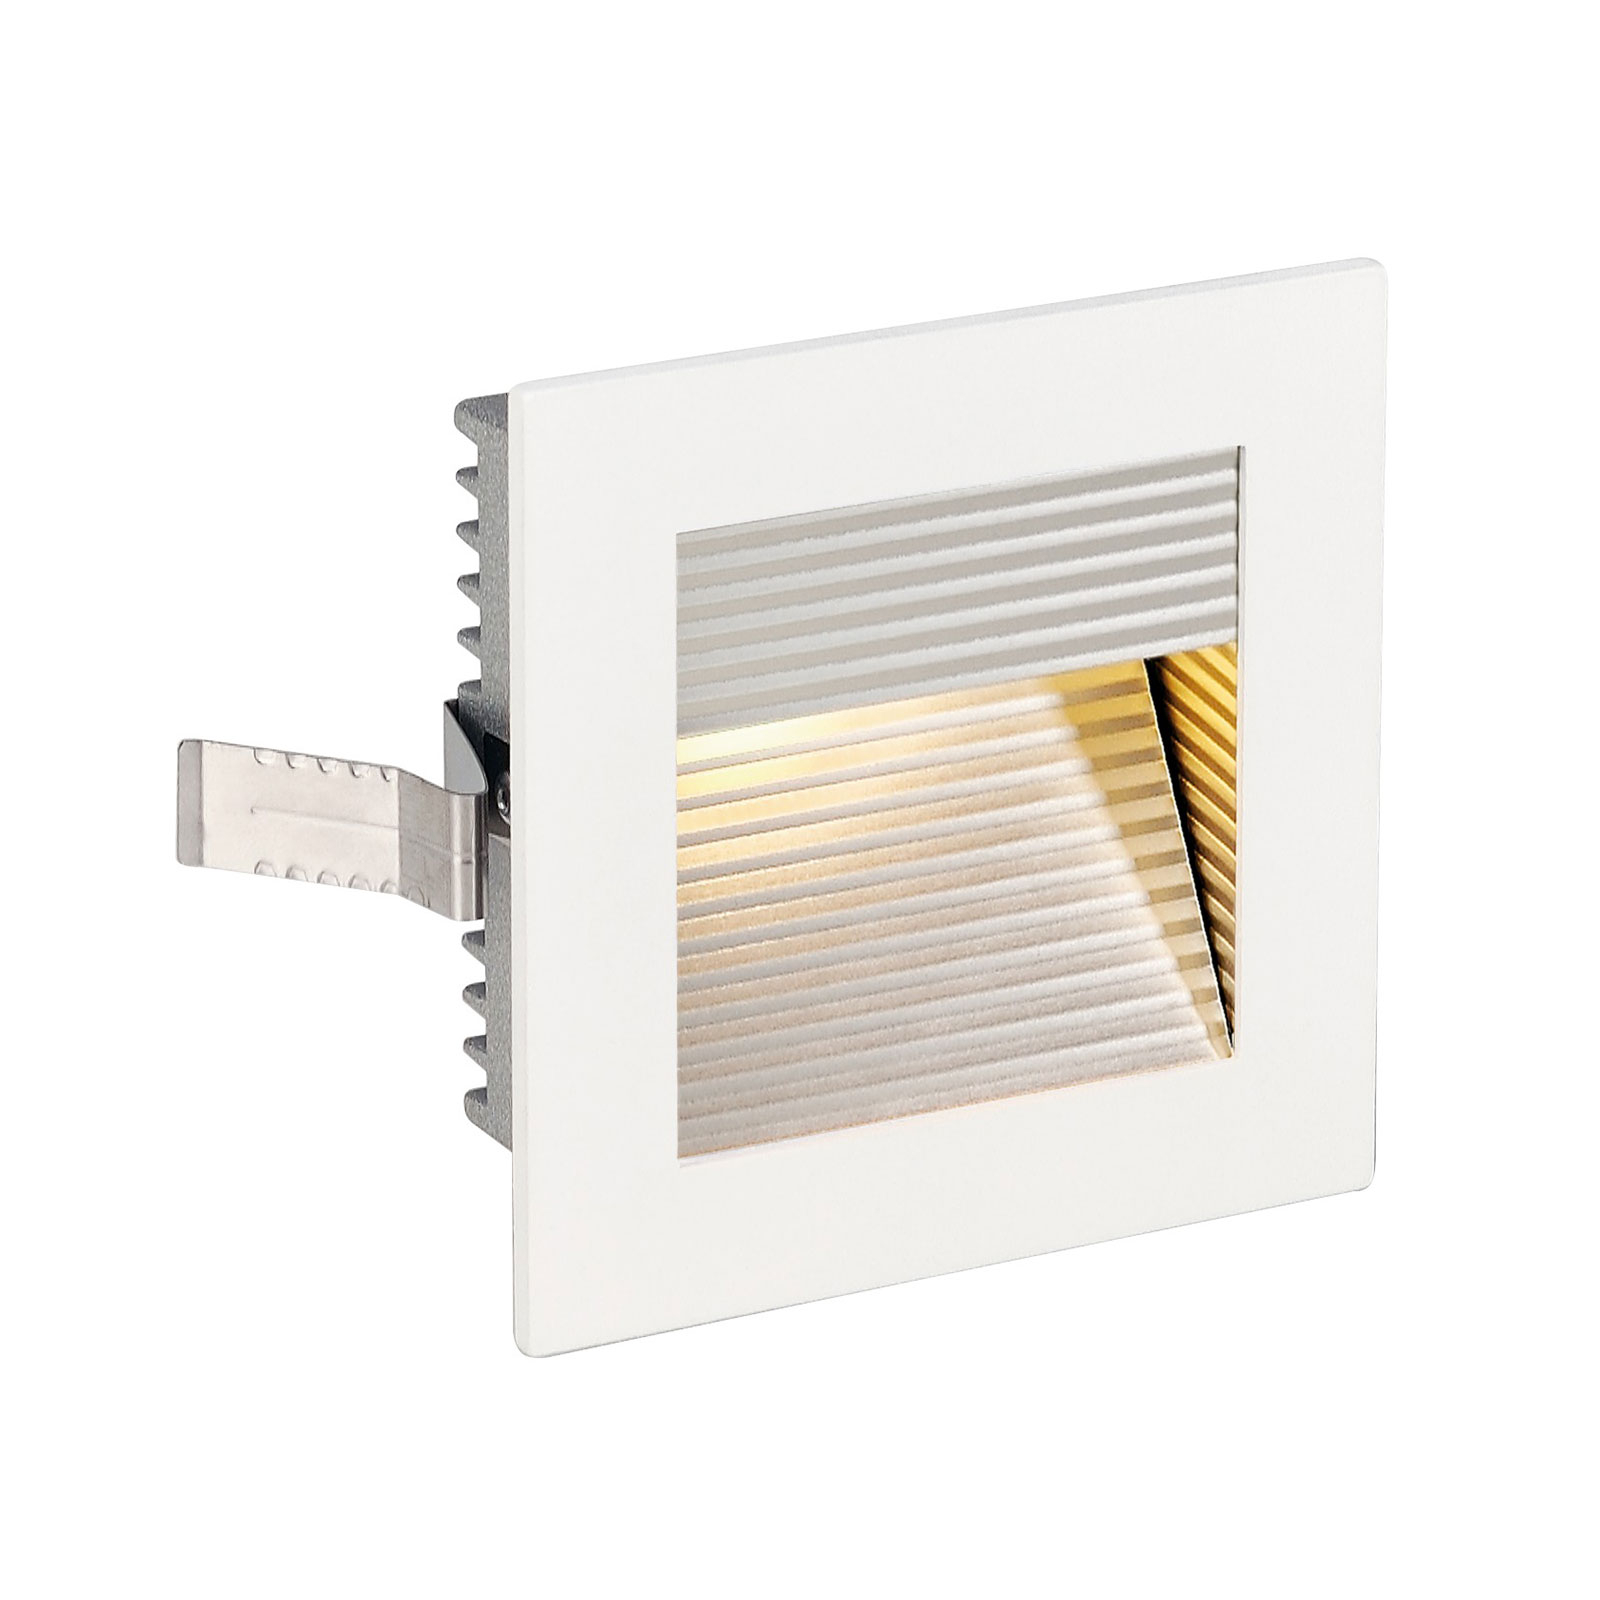 SLV LED-Einbaulampe Frame Curve LED 3.000K weiß